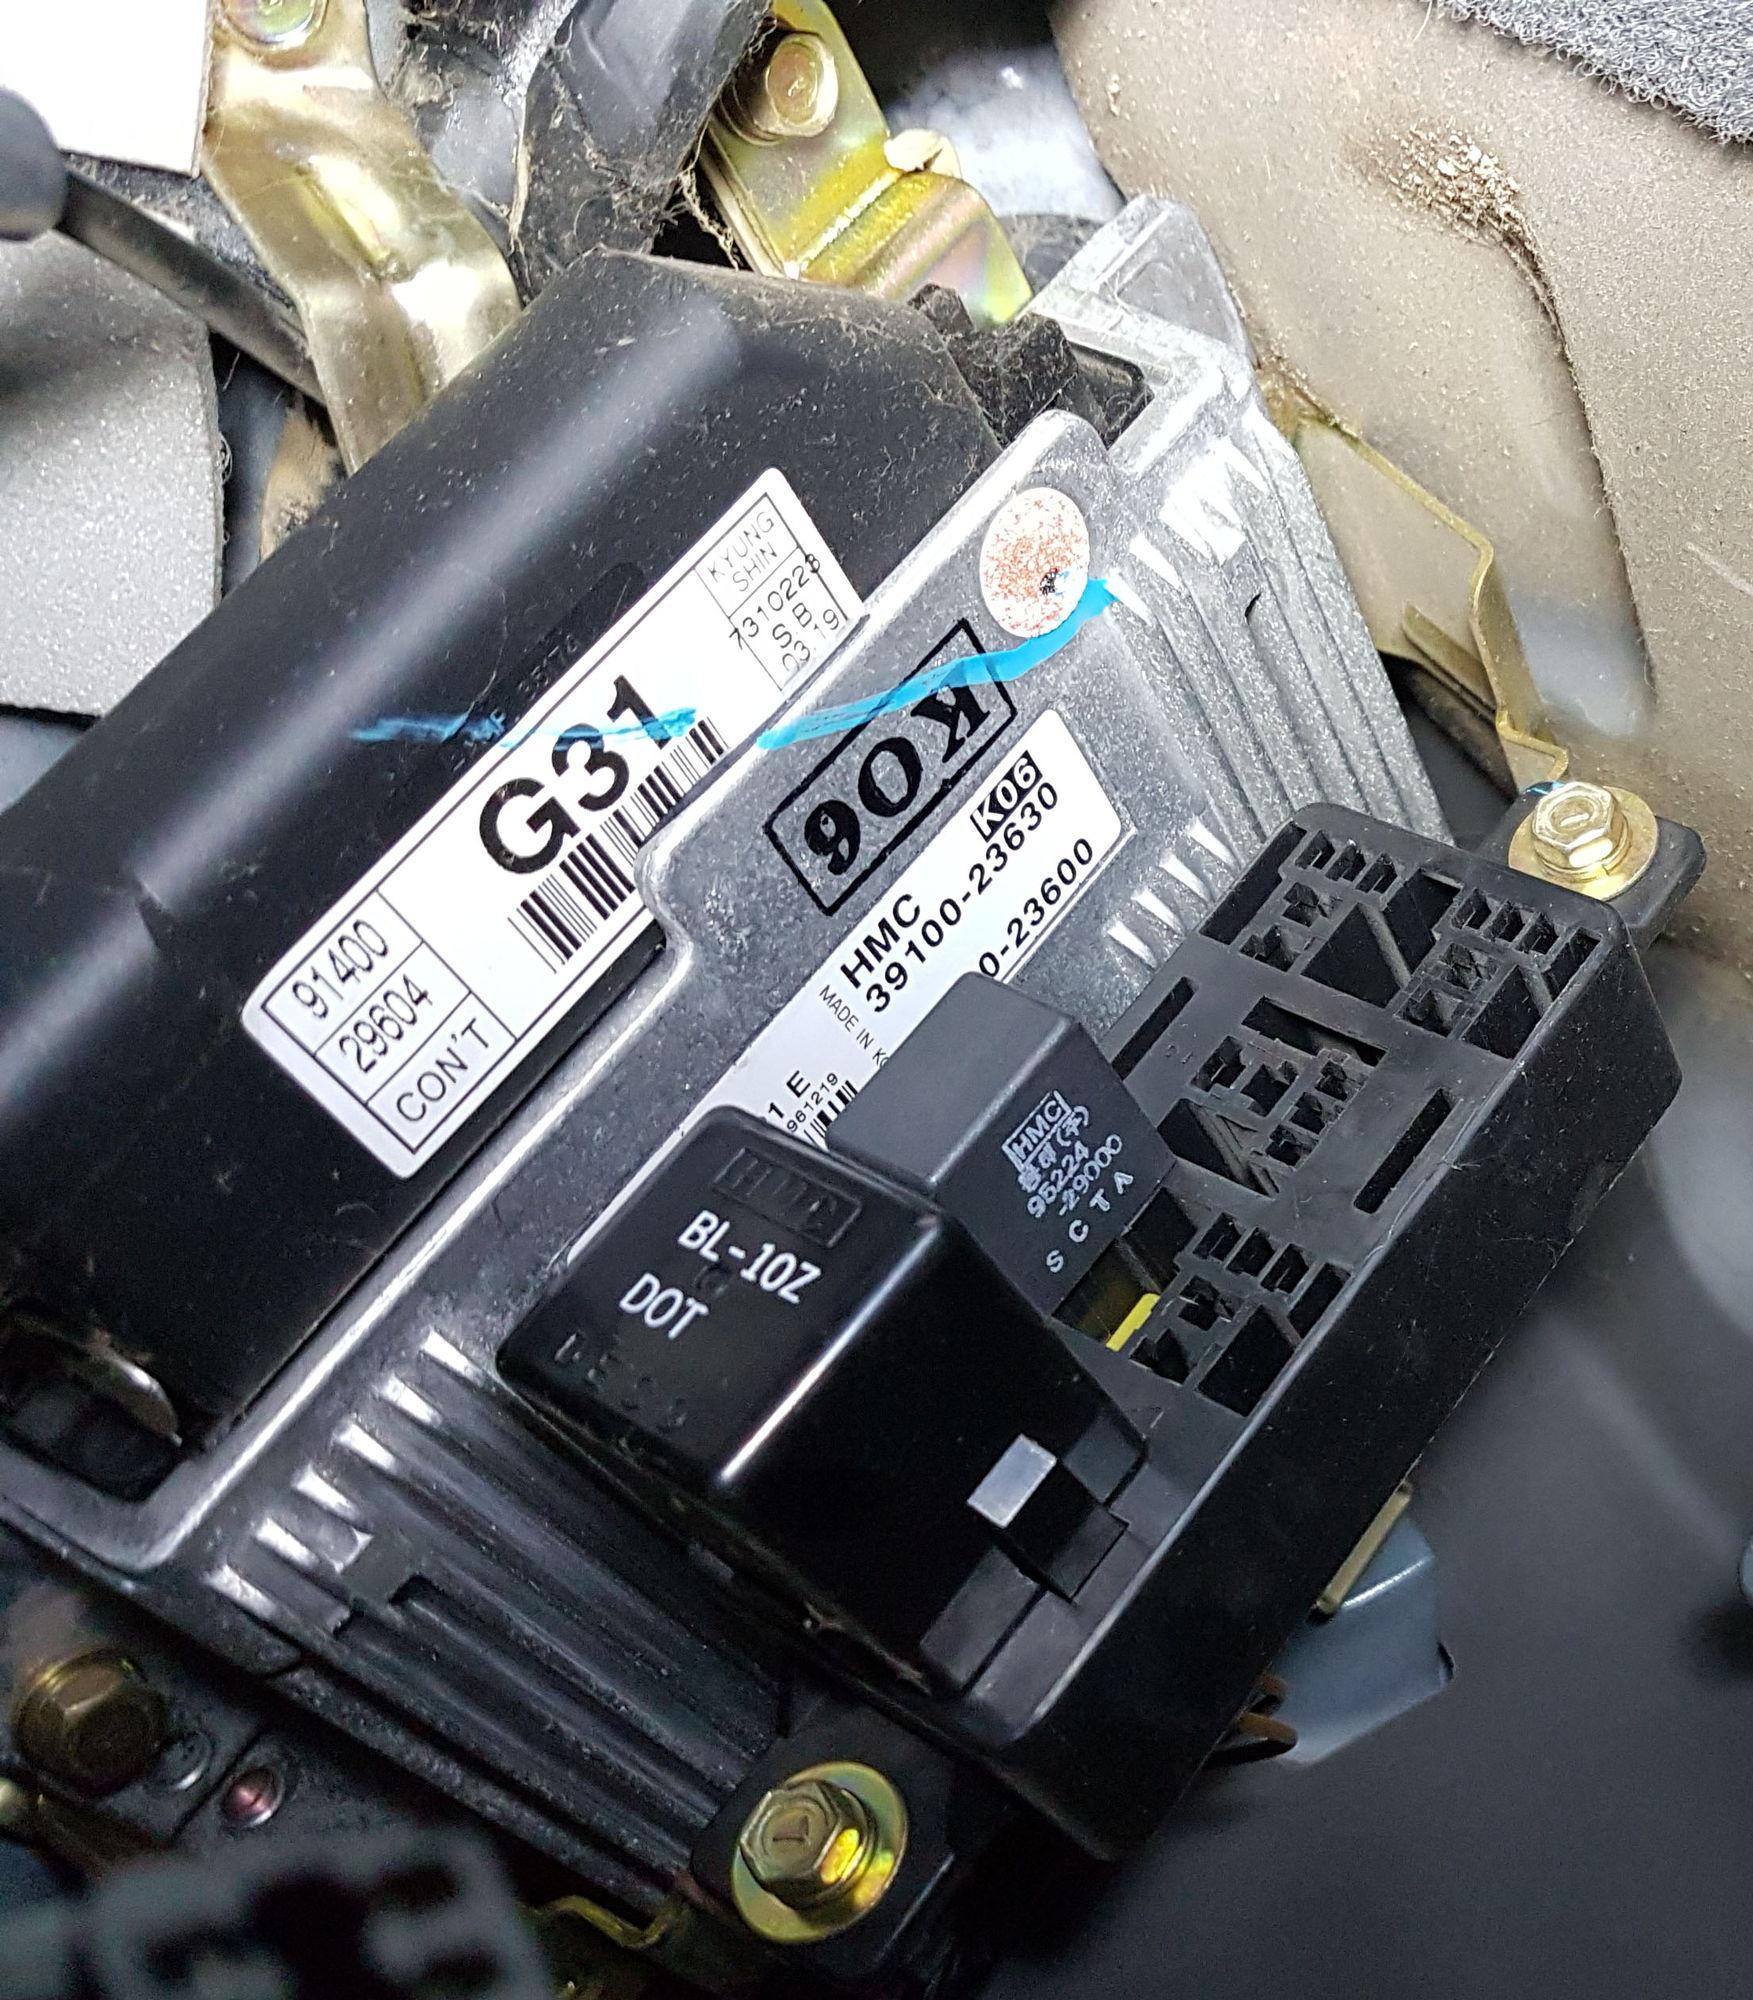 Hqdefault also D Need Some Expertise Run Out Ideas Crankshaft Position Sensor Diagram furthermore Relays A F D Fc B C D D C F Ec moreover Hyundai Santa Fe besides Pic X. on 2000 hyundai sonata fuel pump relay location